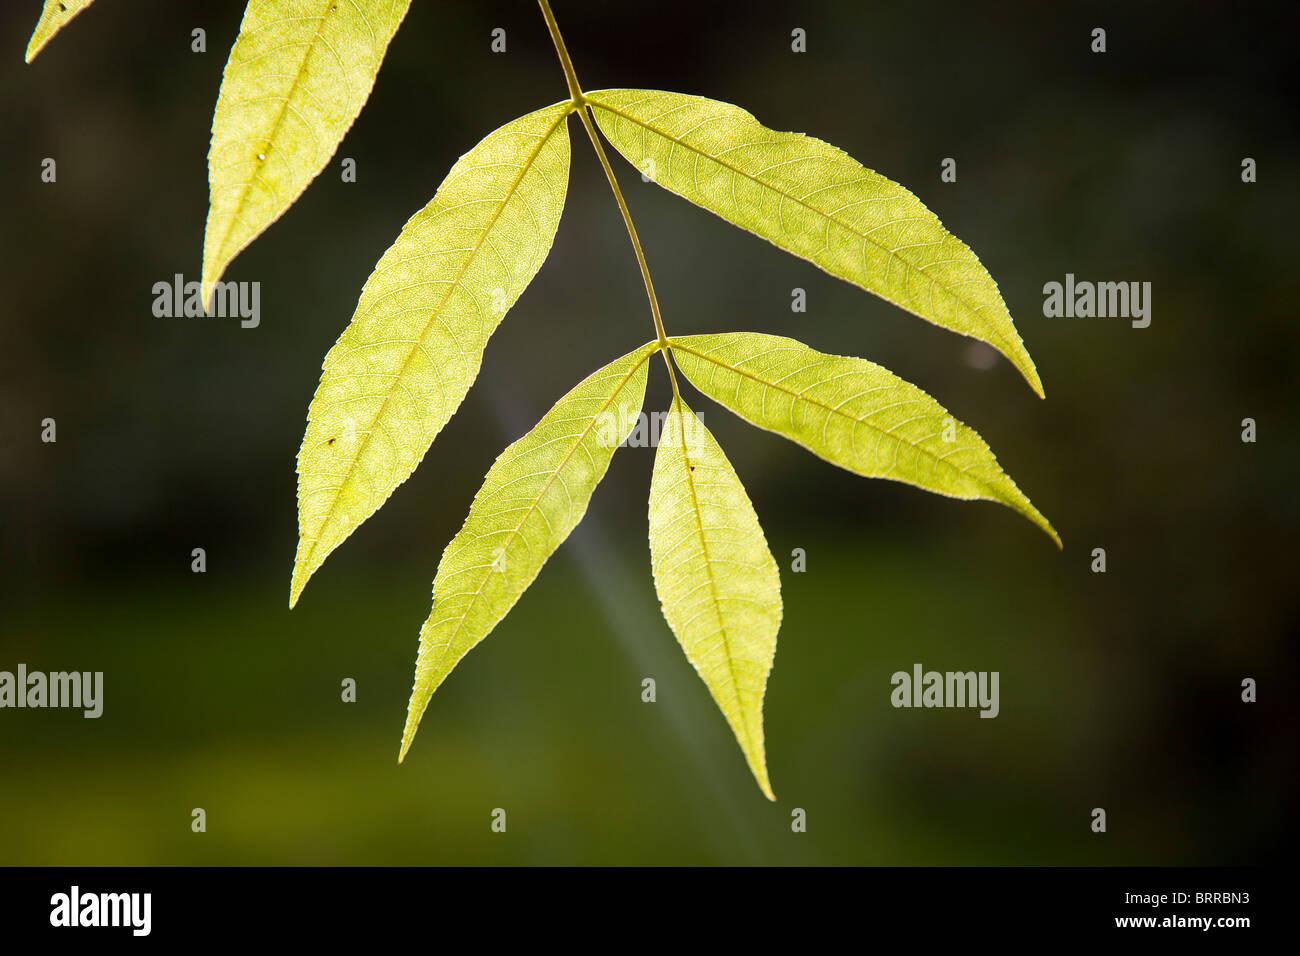 Photosynthesis sun shining ash tree leaves - Stock Image